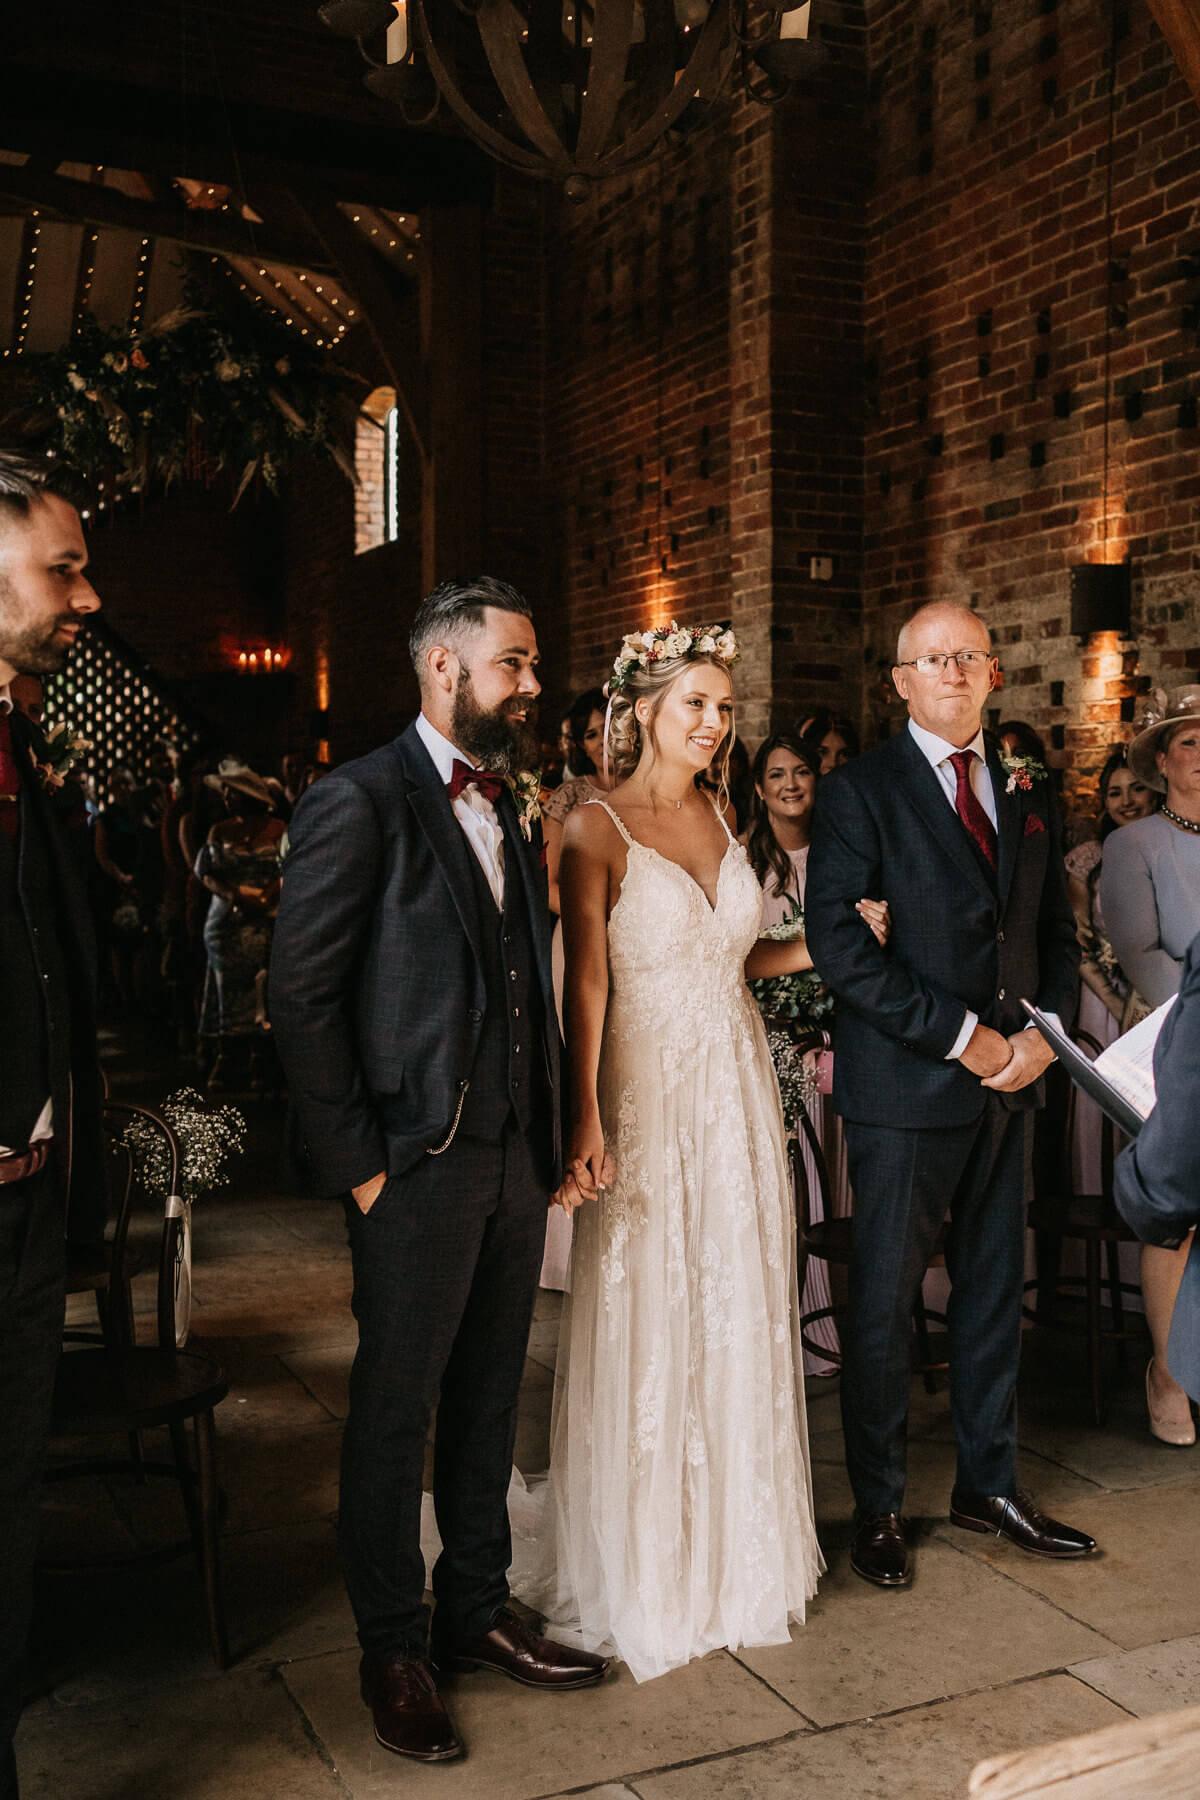 Wedding ceremony at Shustoke Farm Barn